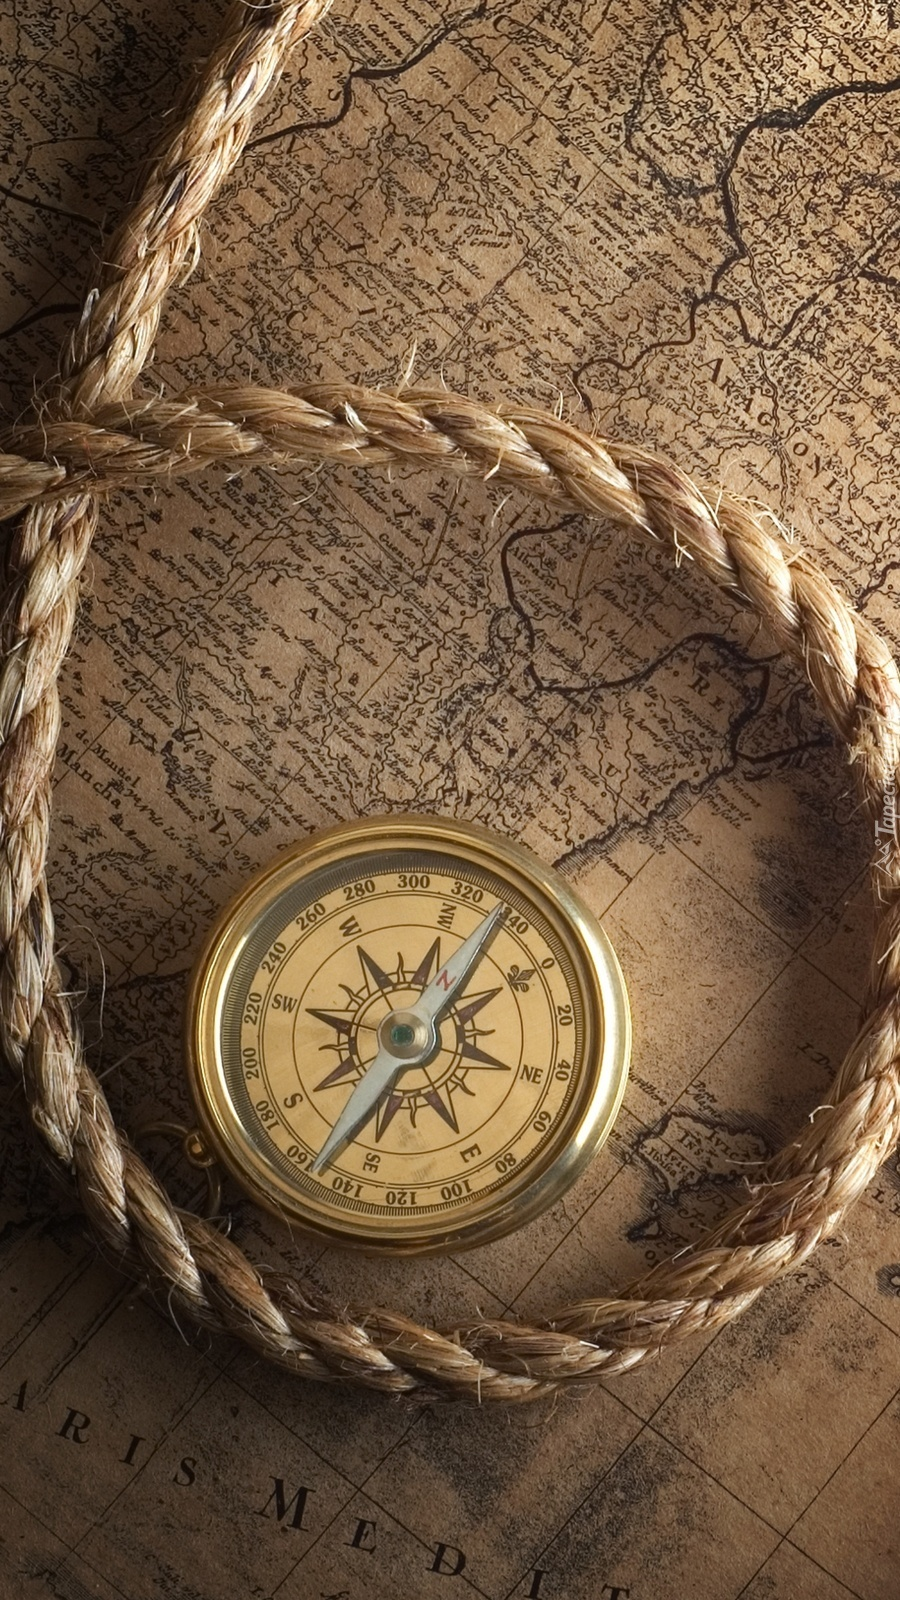 Kompas i sznur na starej mapie